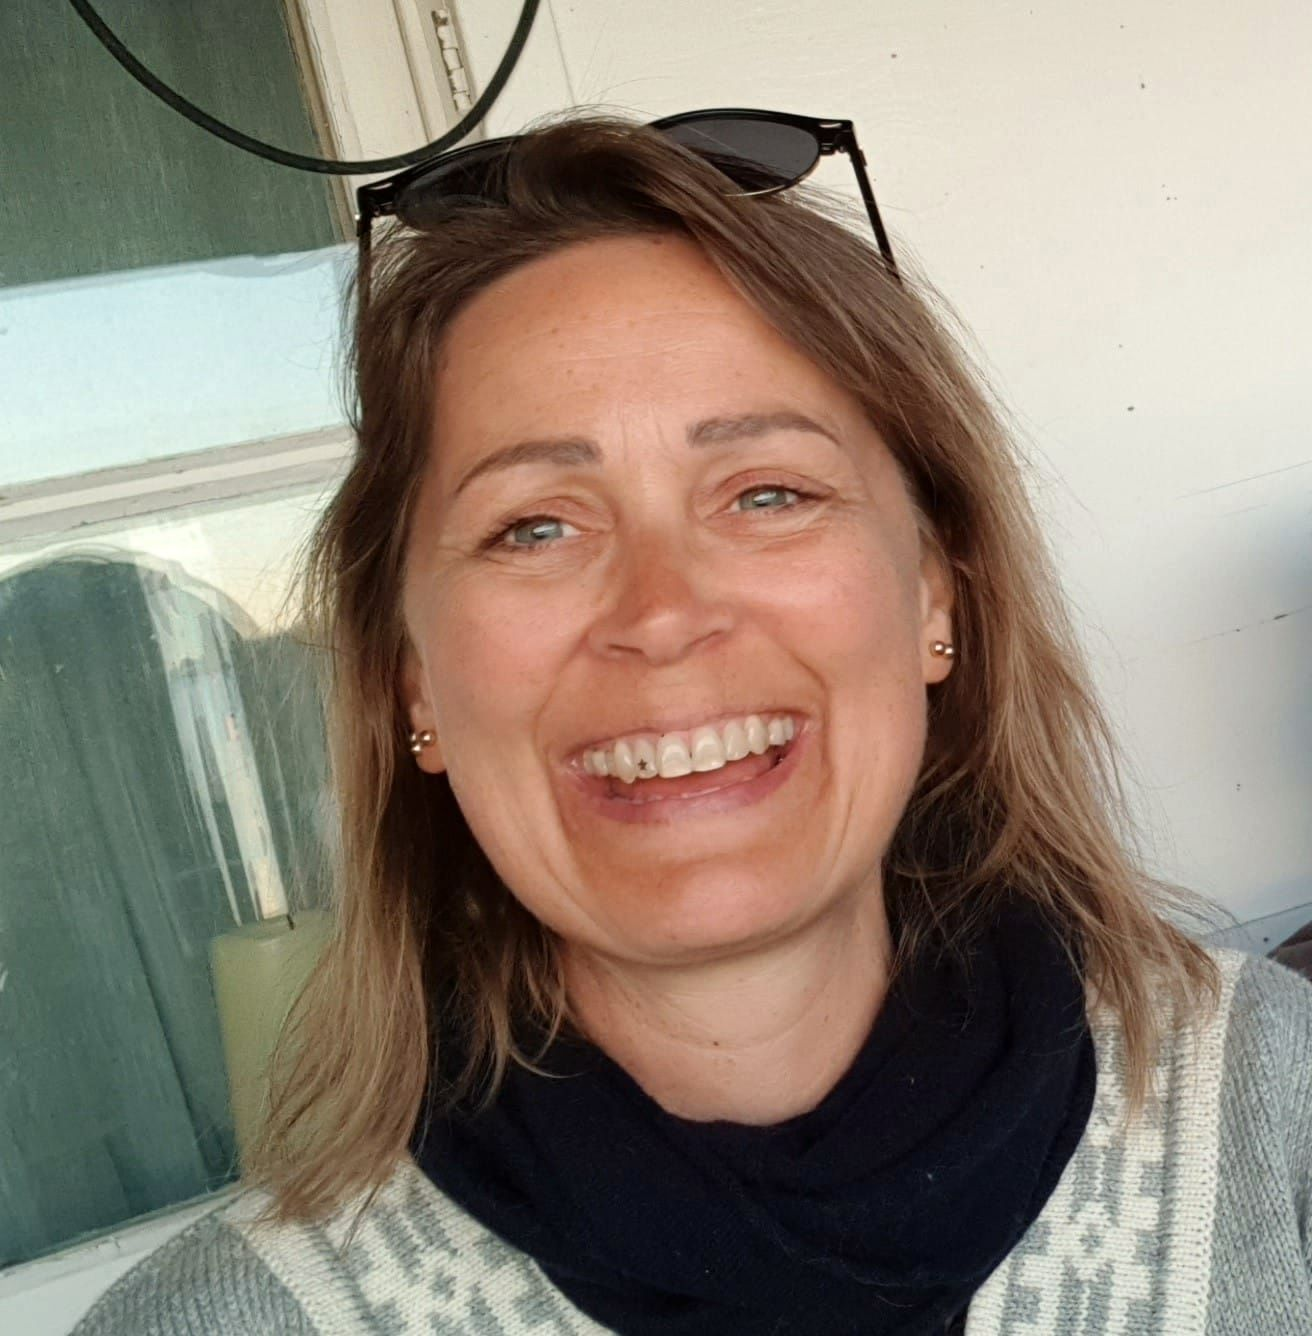 Eli-Ane Brun